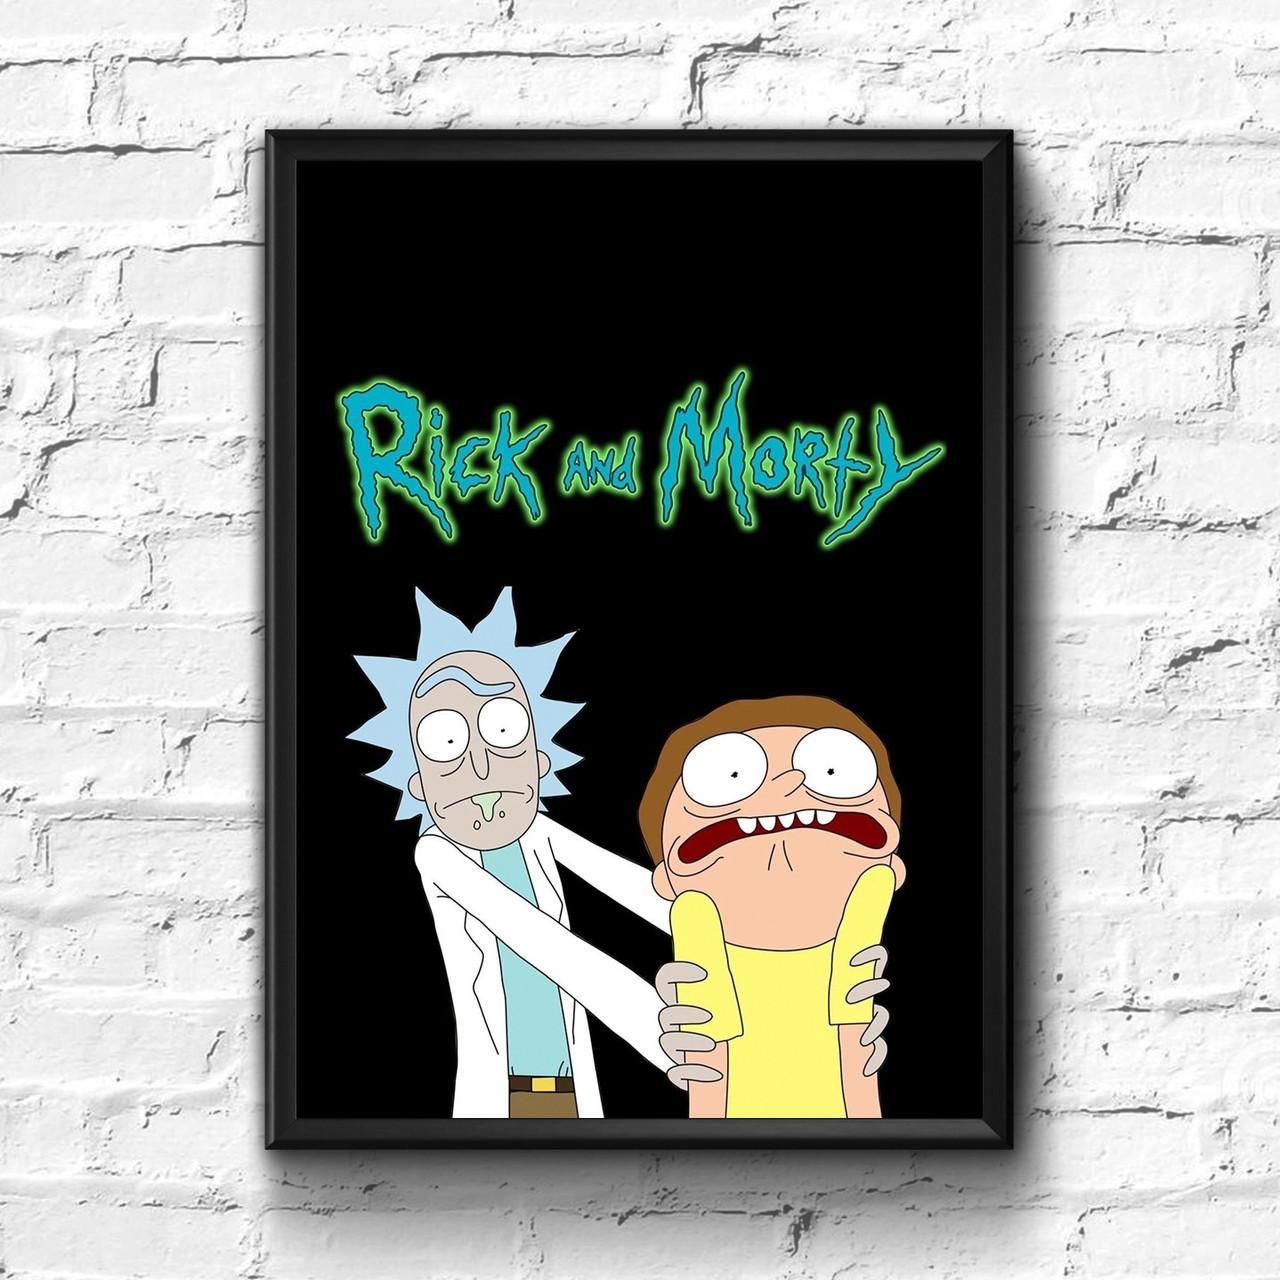 Постер с рамкой Rick and Morty #11